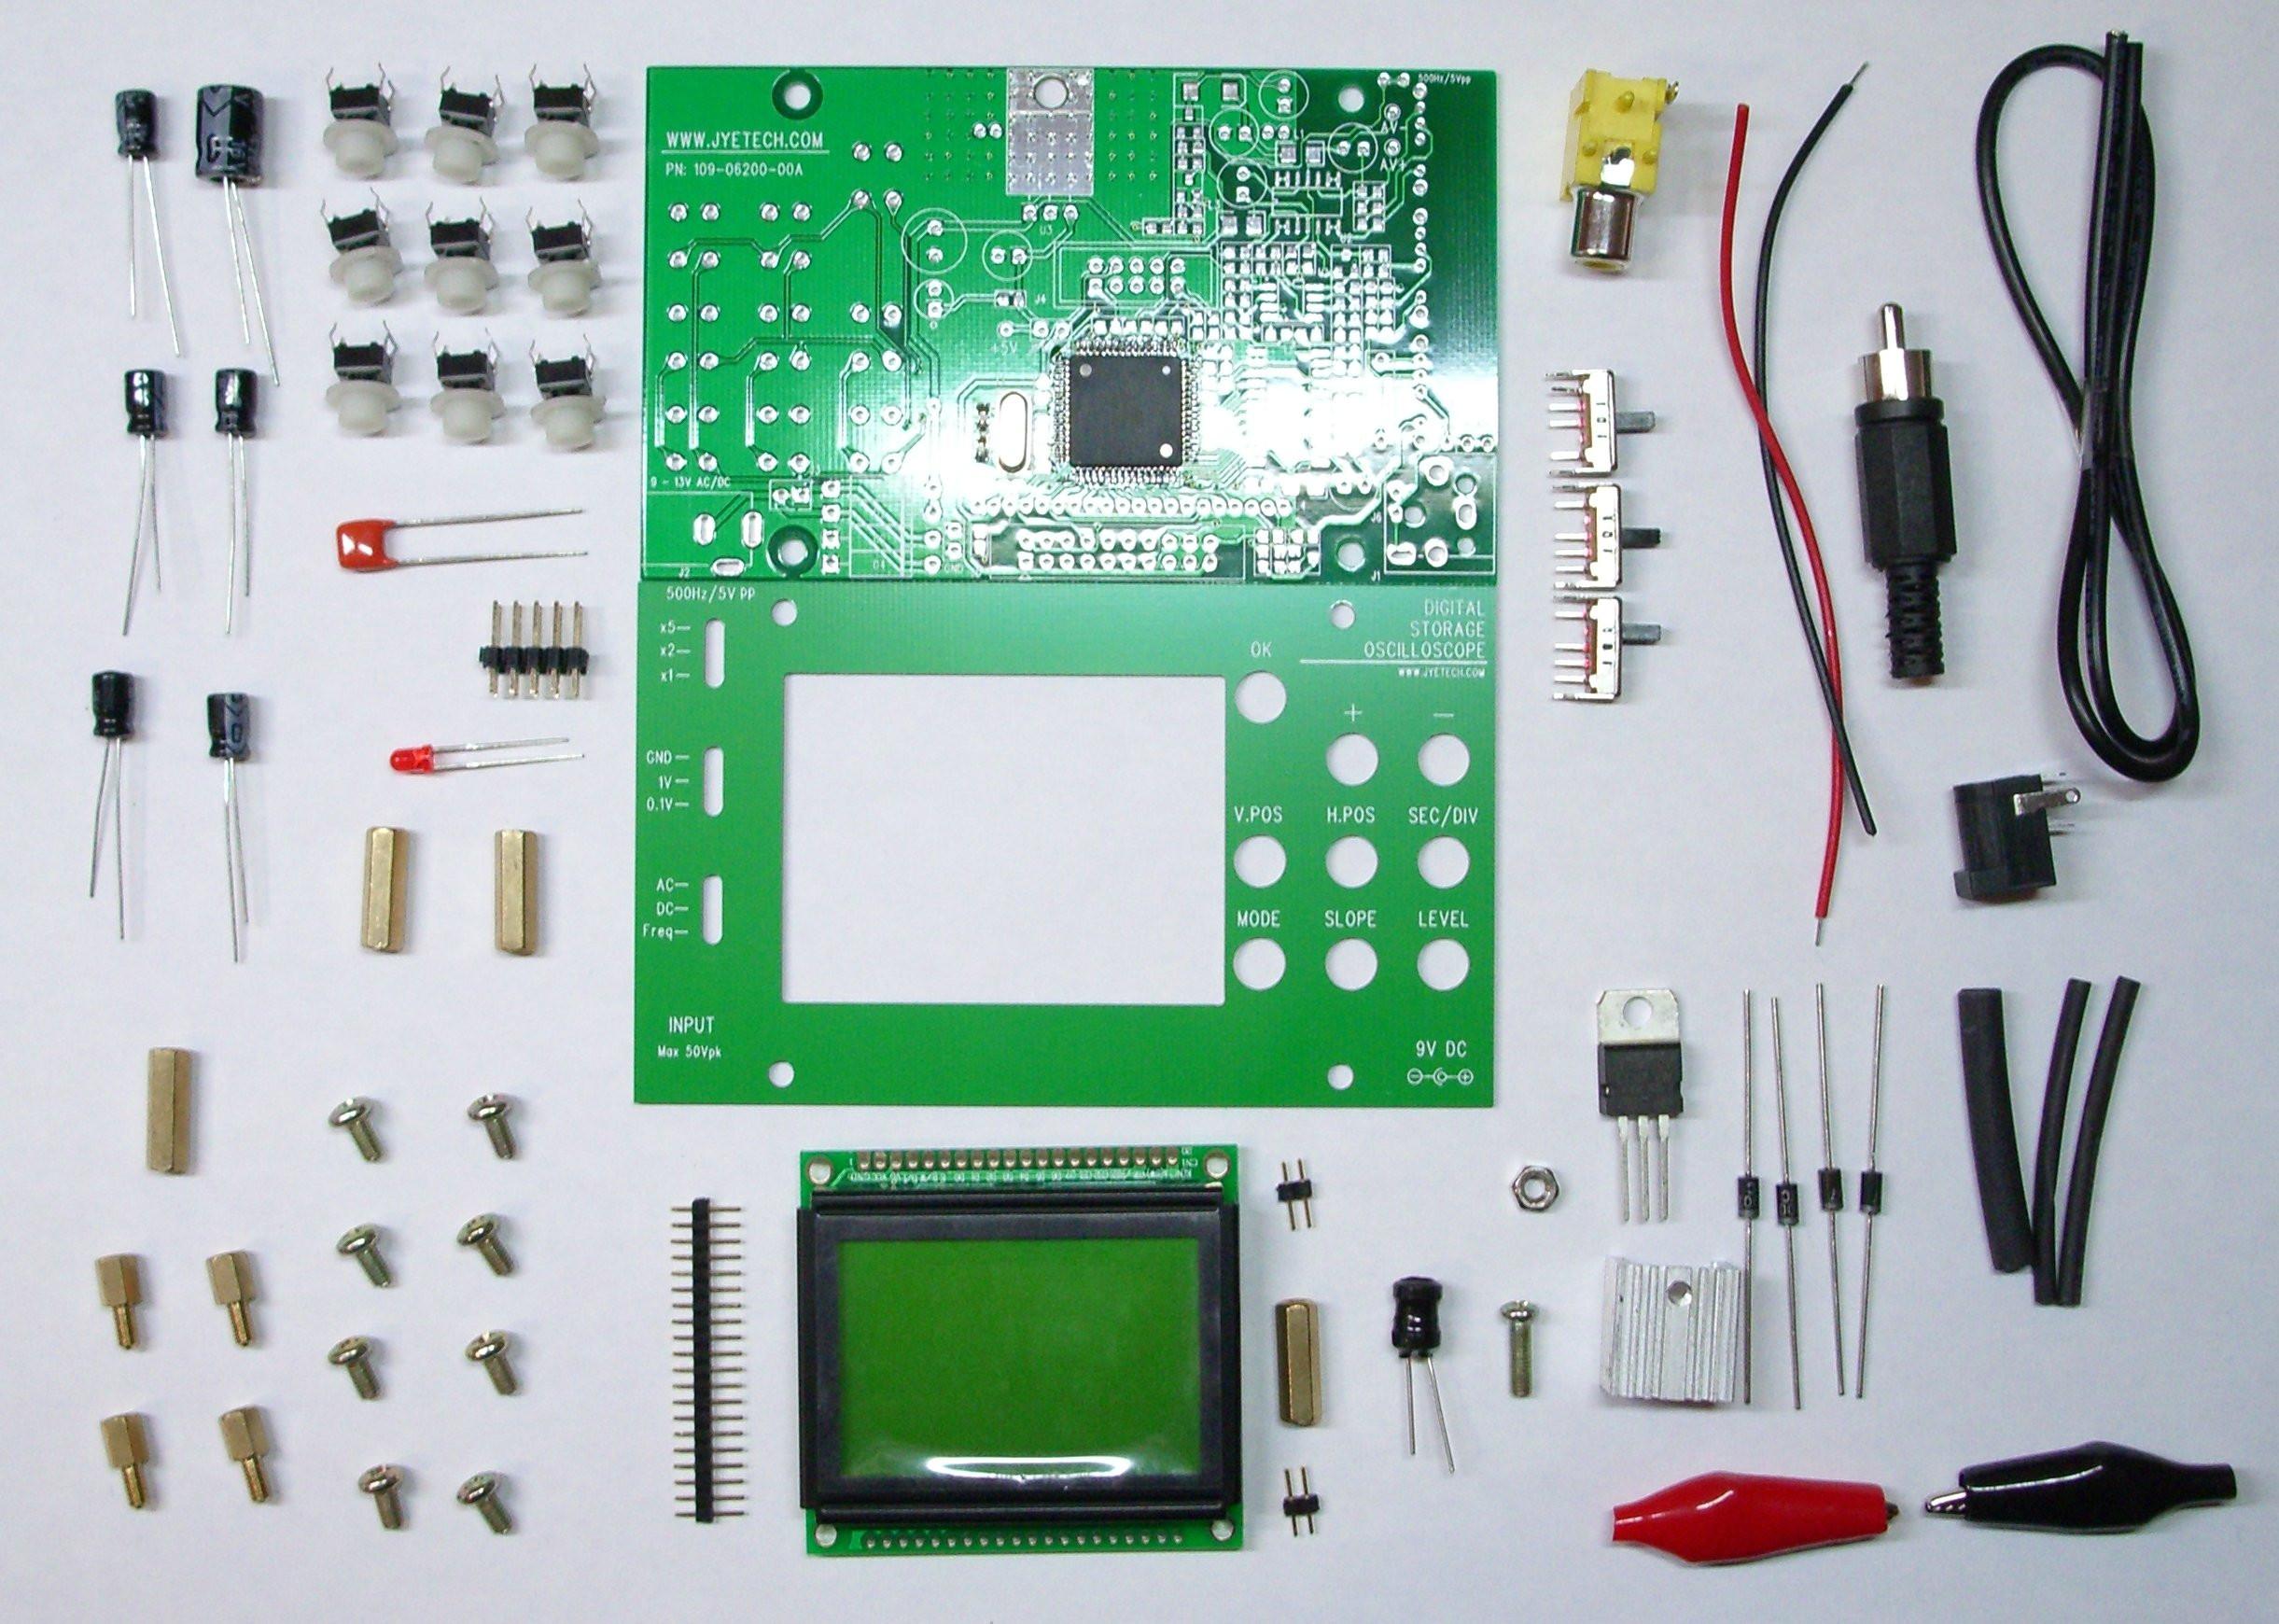 Diy Oscilloscope  Jyetech AVR digital oscilloscope DIY KIT — Firmware